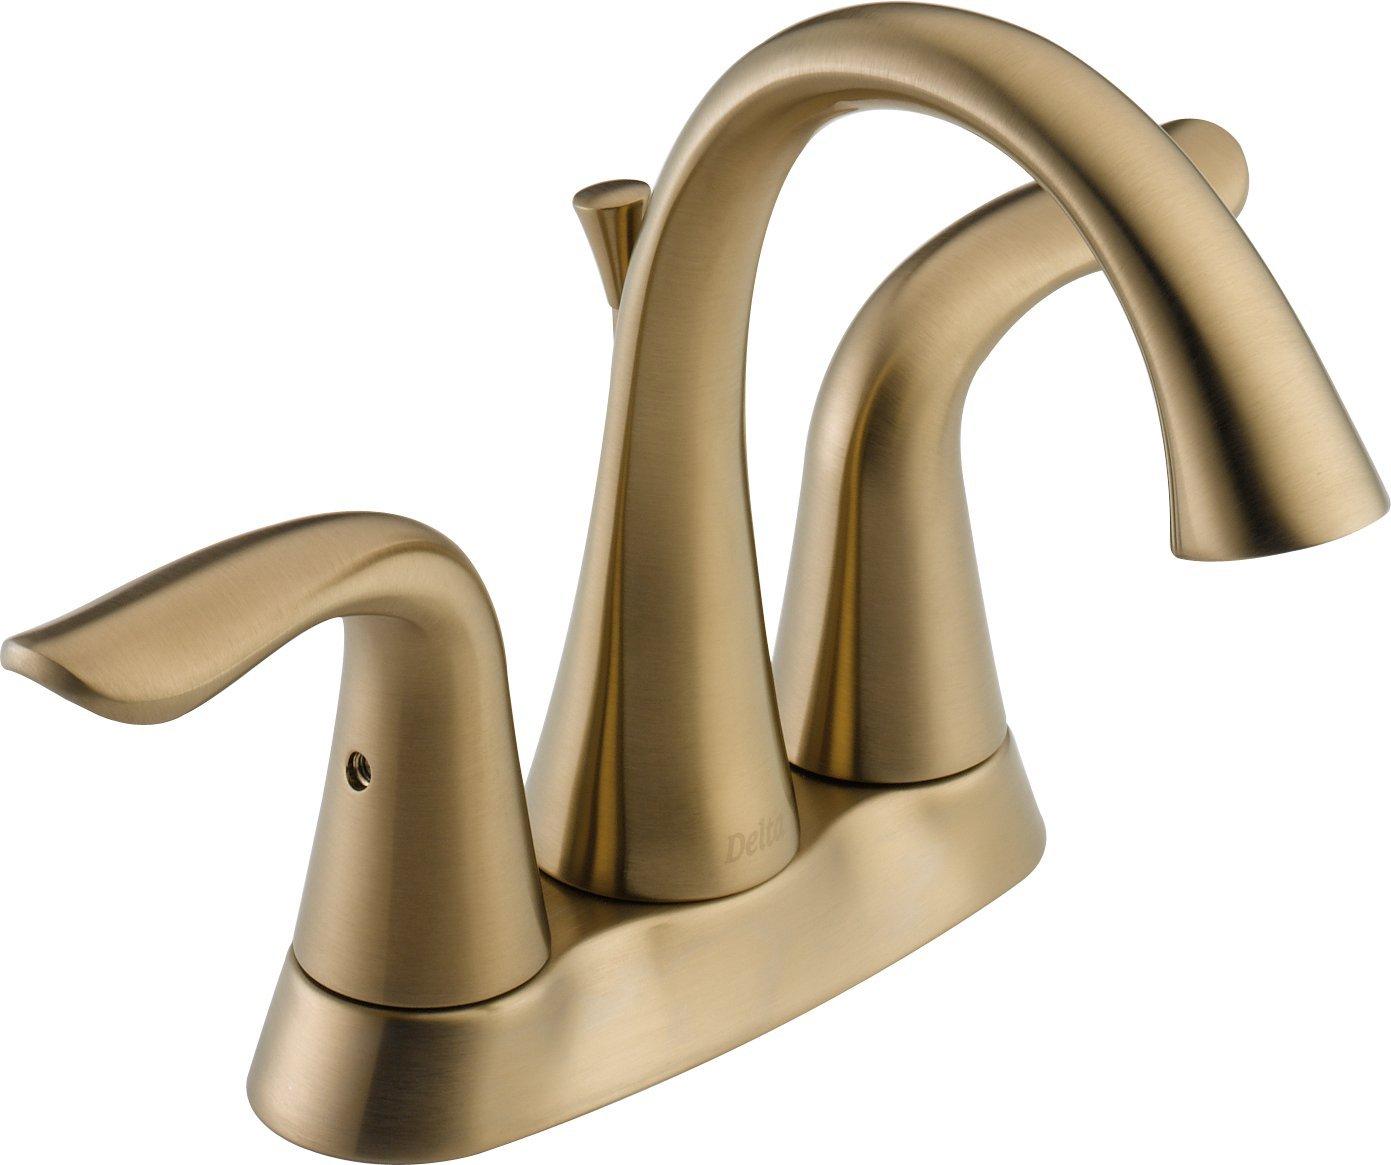 4 minispread bathroom faucets - Delta Faucet 2538lf Czmpu Lahara Two Handle Centerset Bathroom